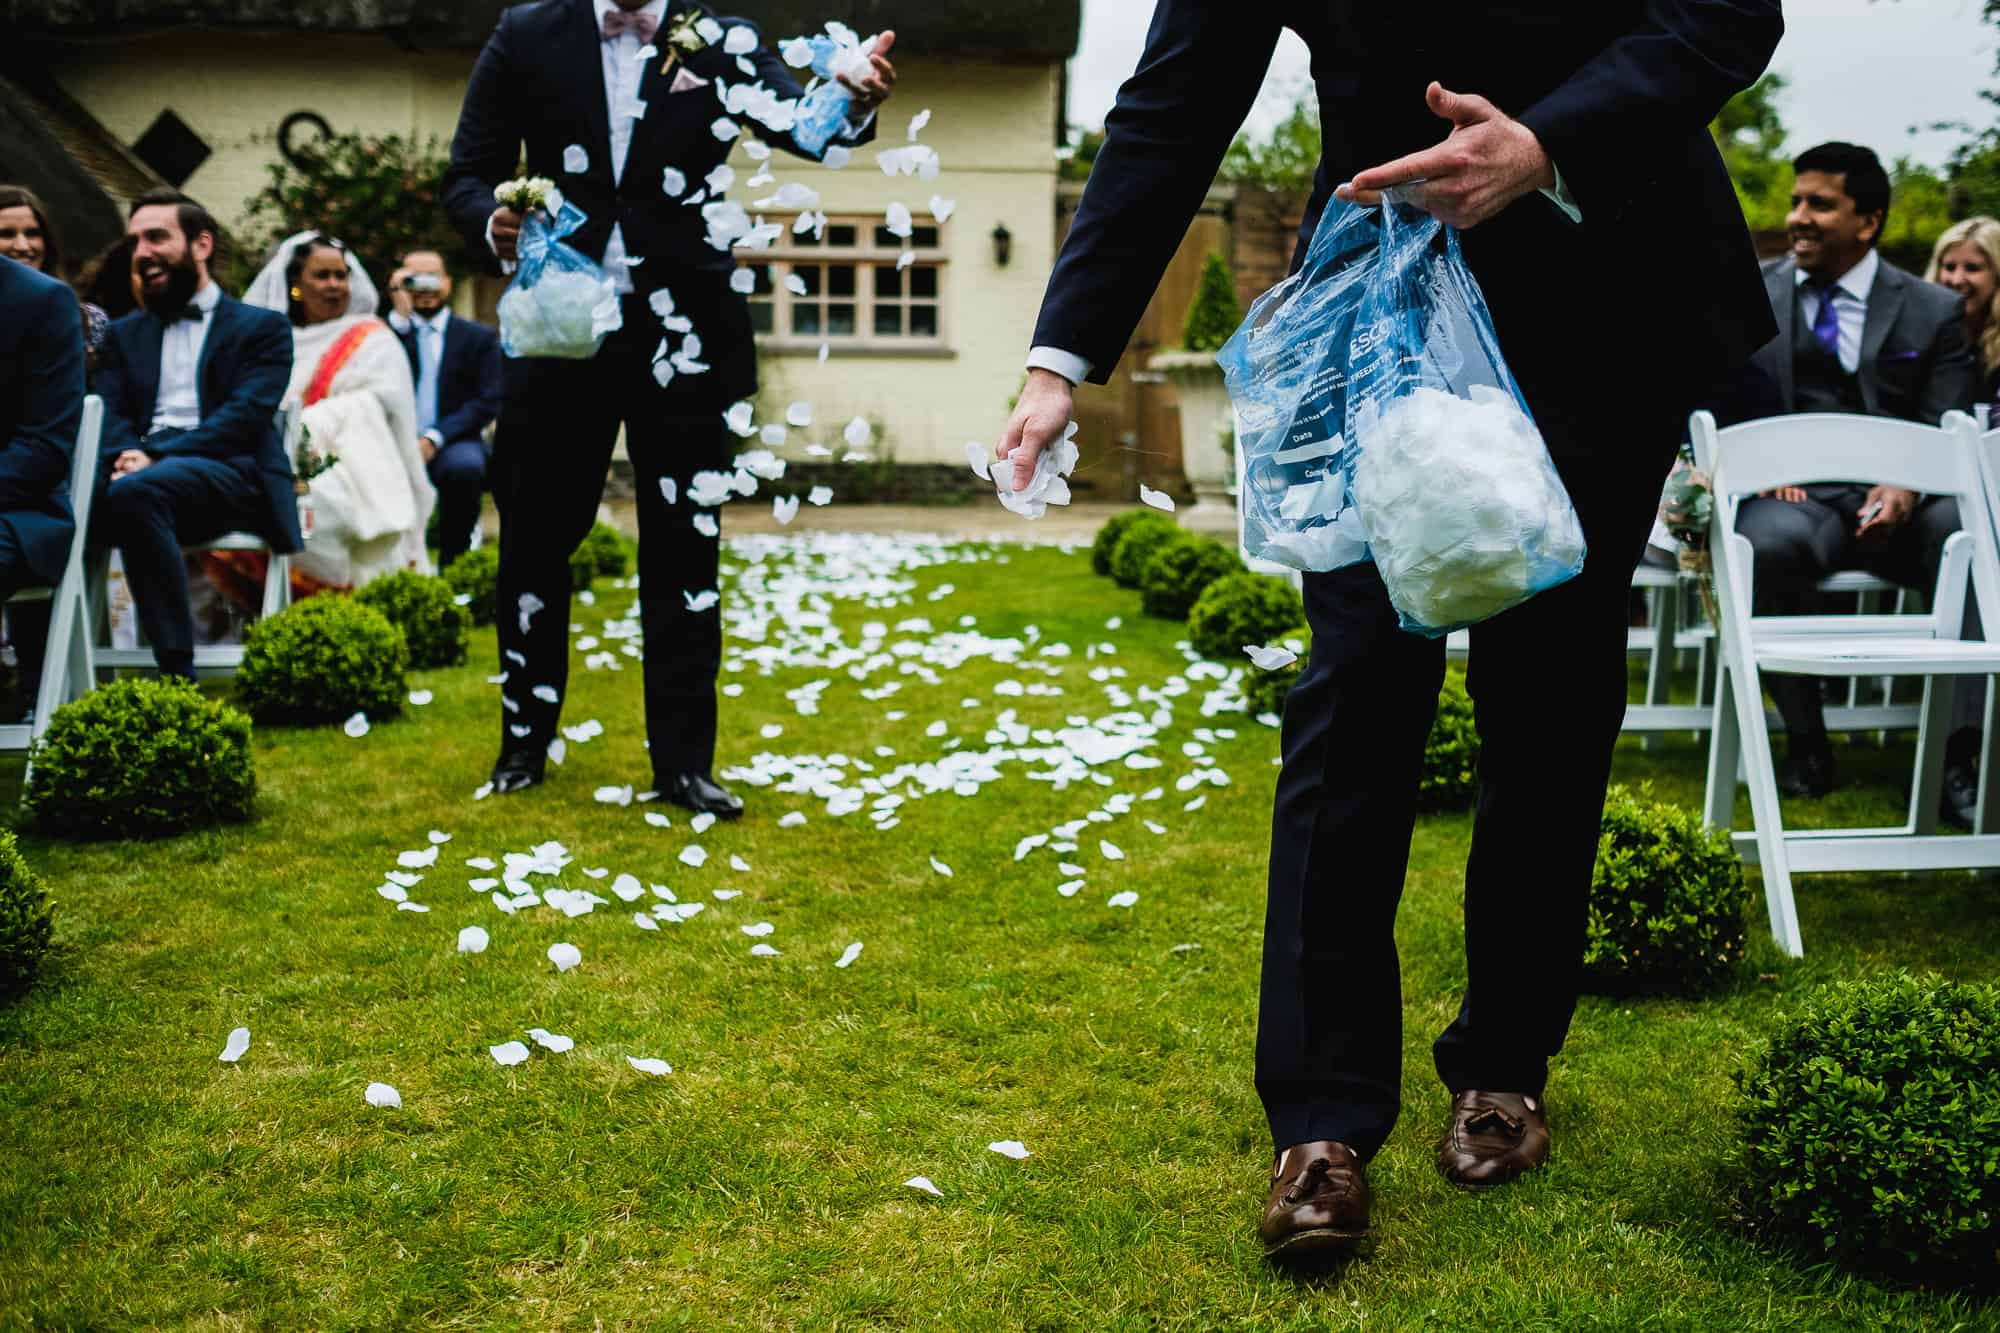 marleybrook-house-wedding-photography-matt-tyler-0022